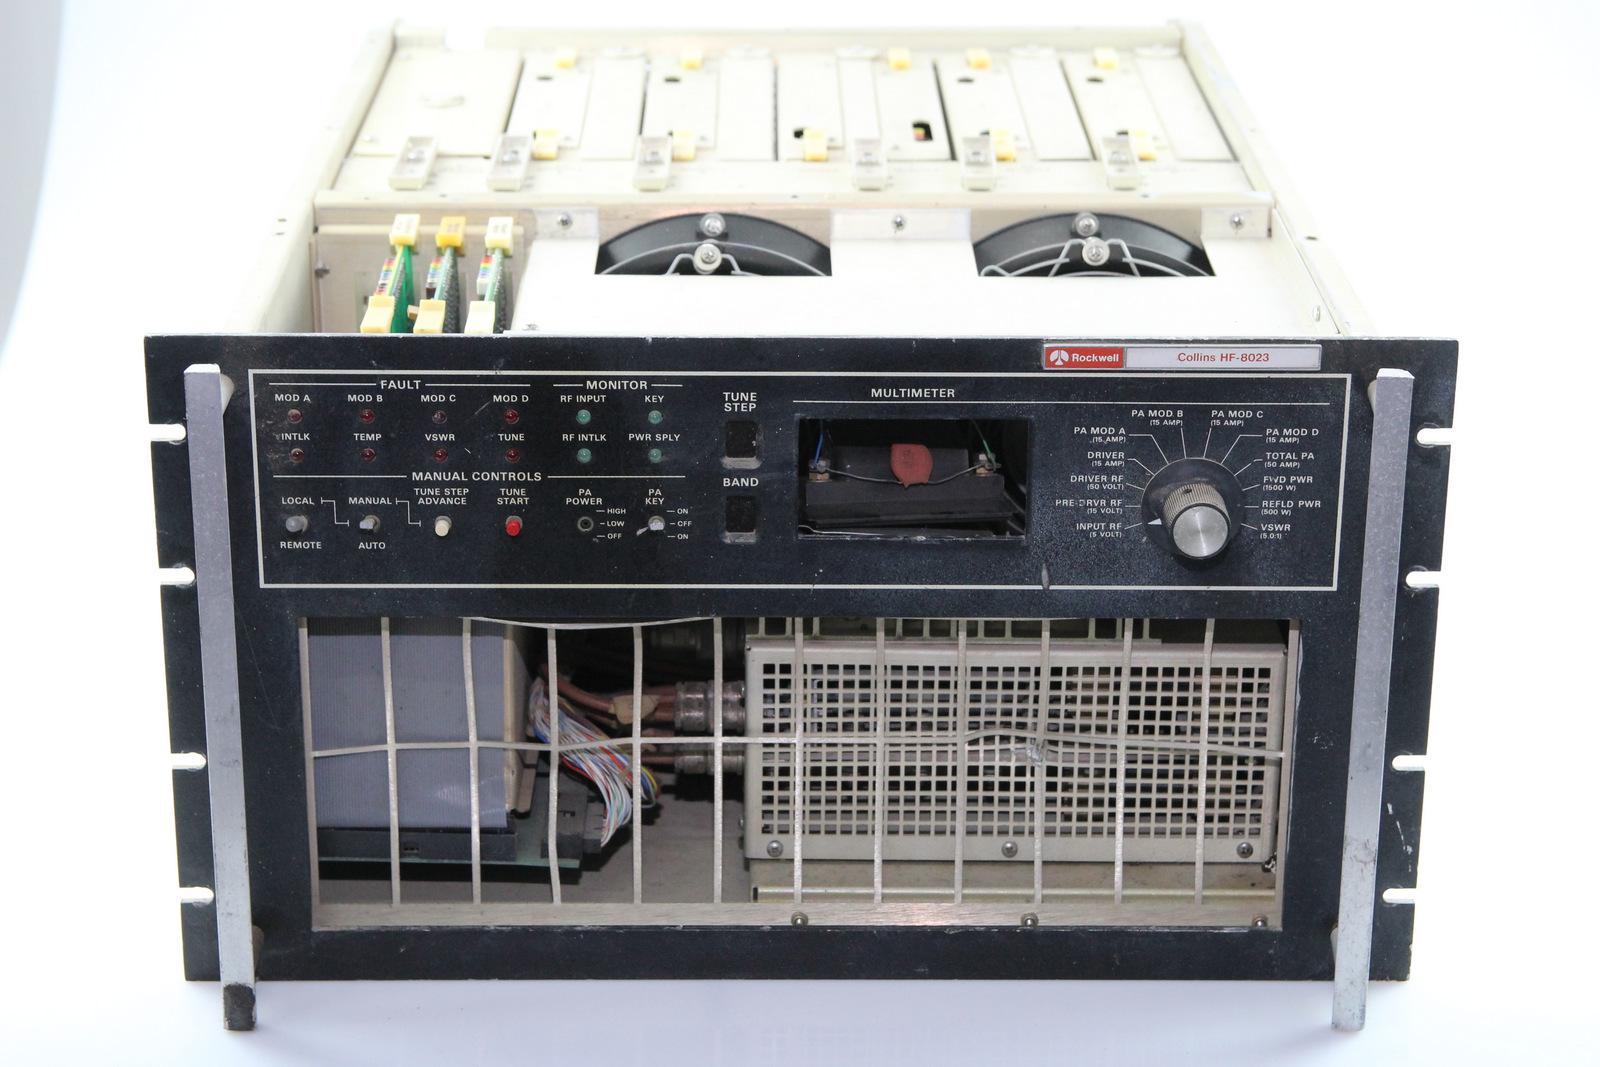 Surplus Electronic Test Equipment : Collins hf amplifier ebay